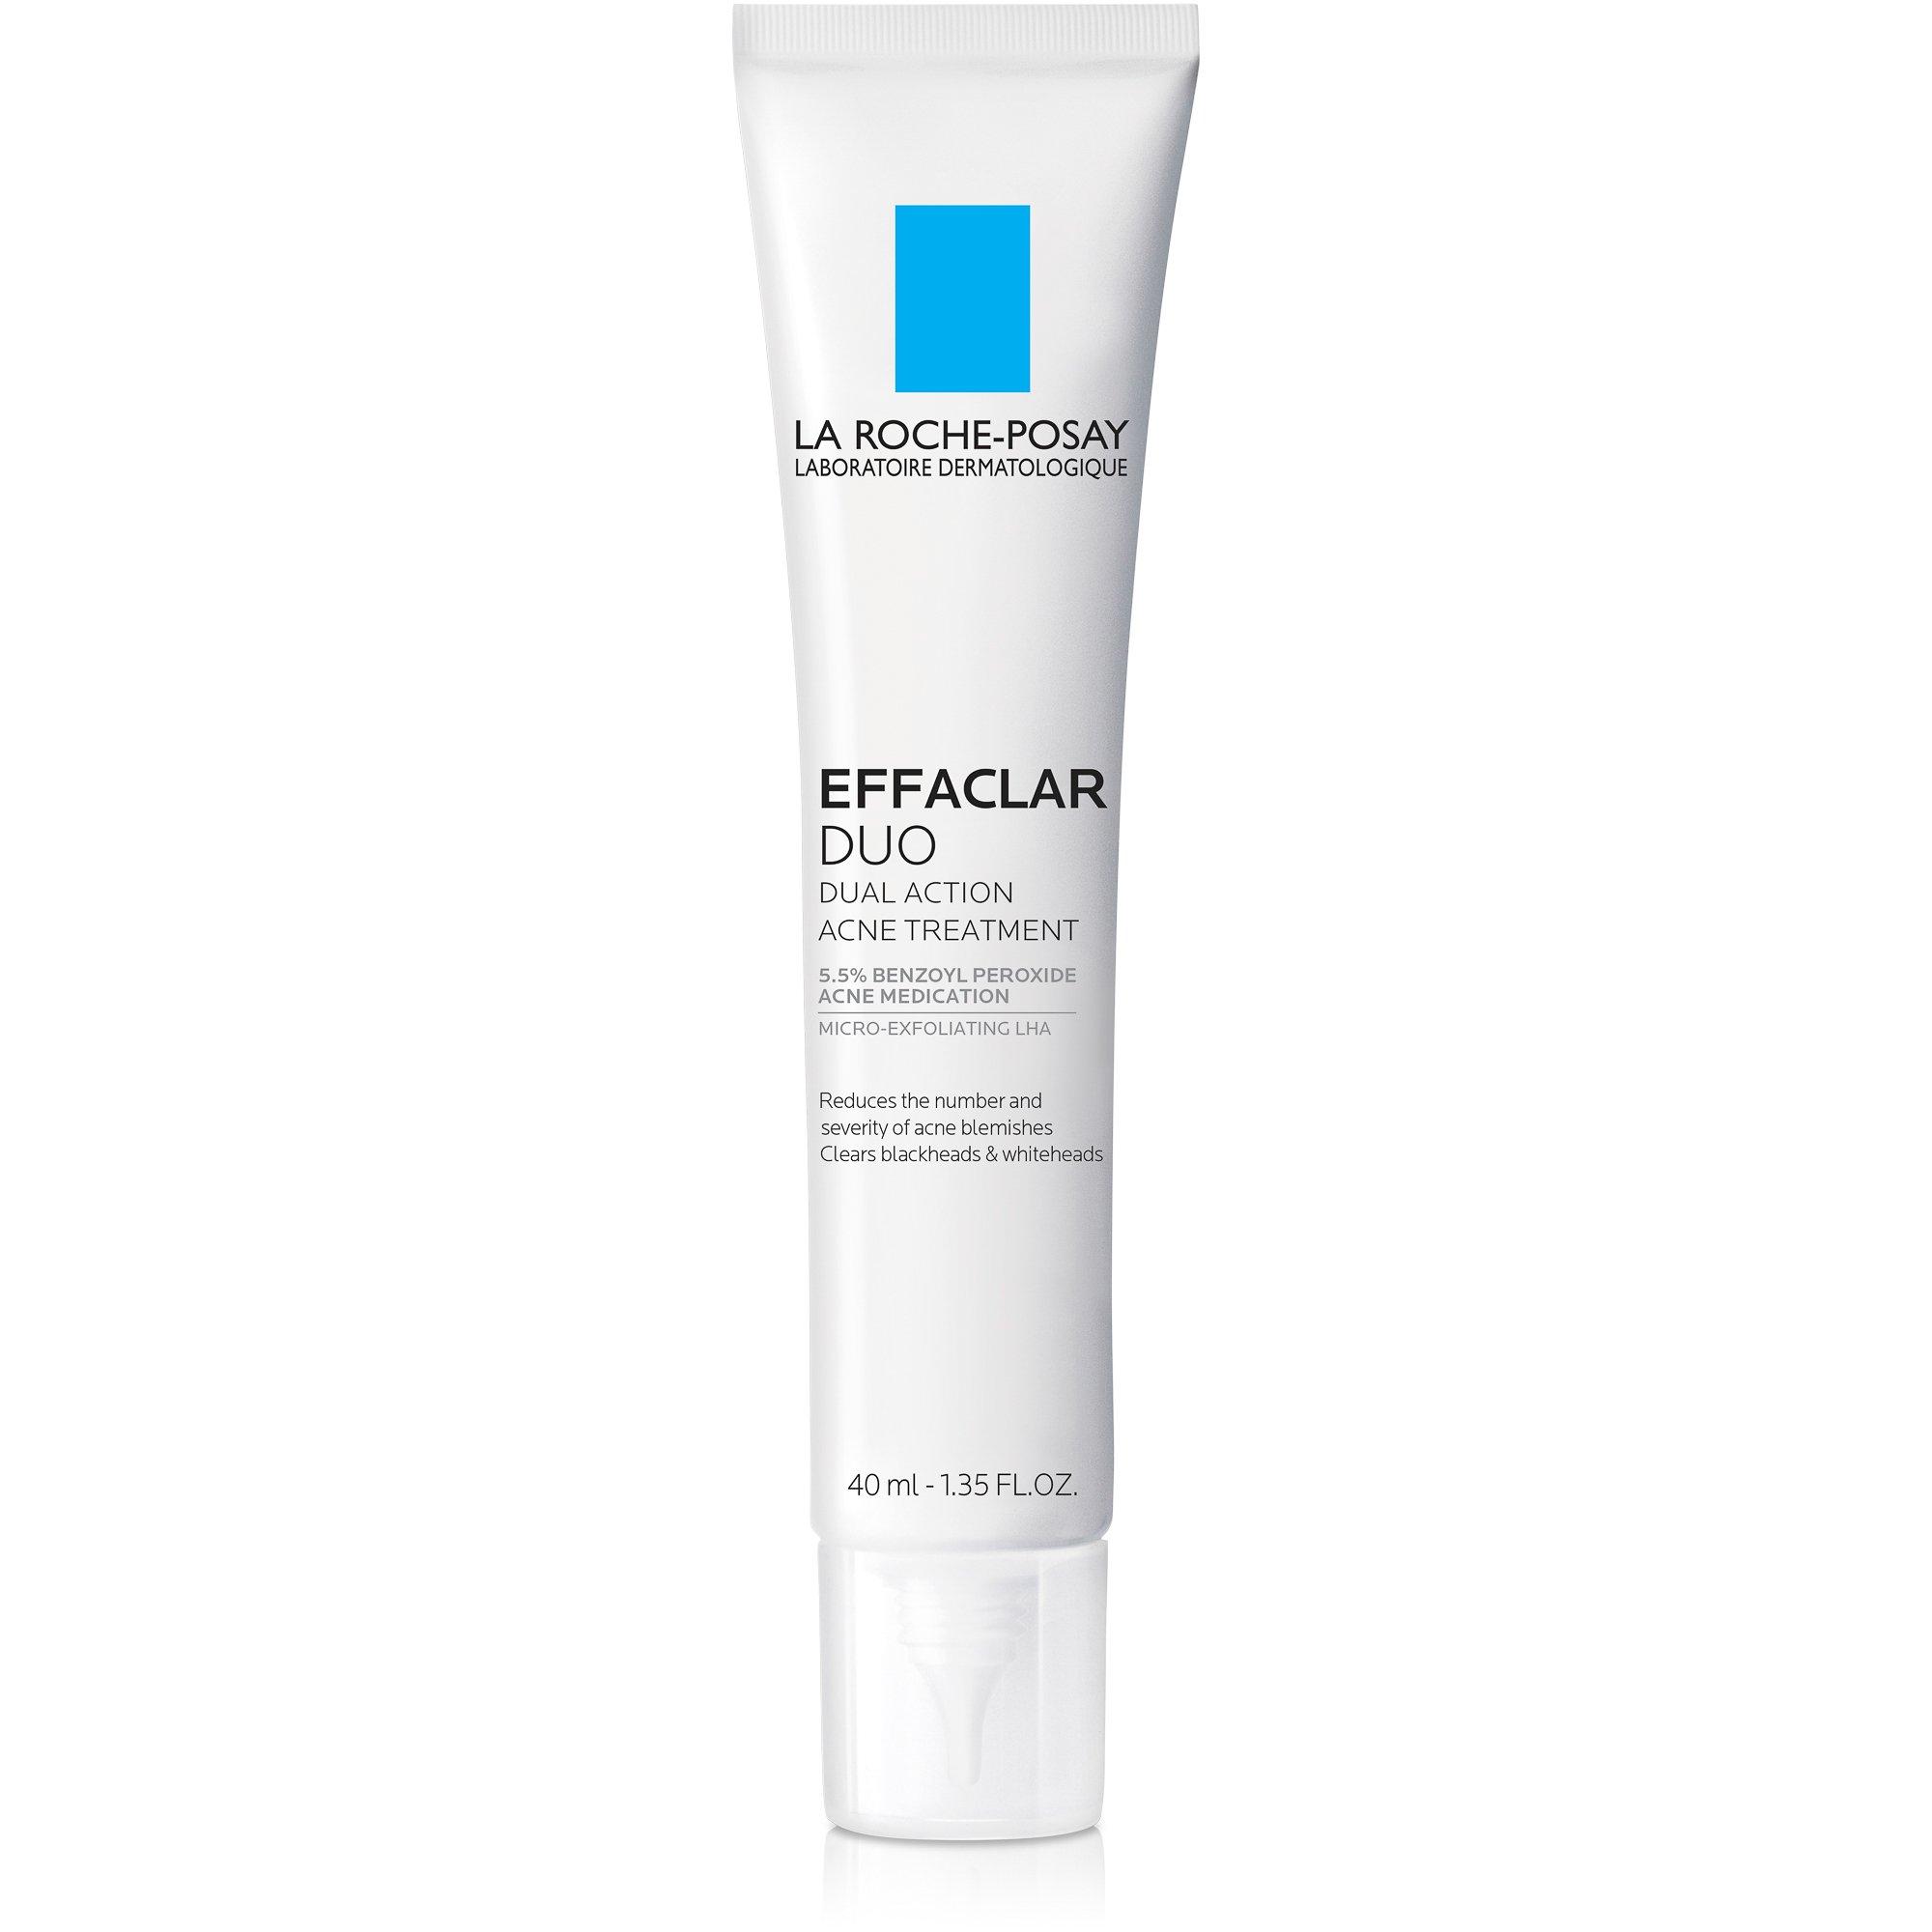 La Roche-Posay Effaclar Duo Acne Treatment with Benzoyl Peroxide, 1.35 Fl. Oz. by La Roche-Posay